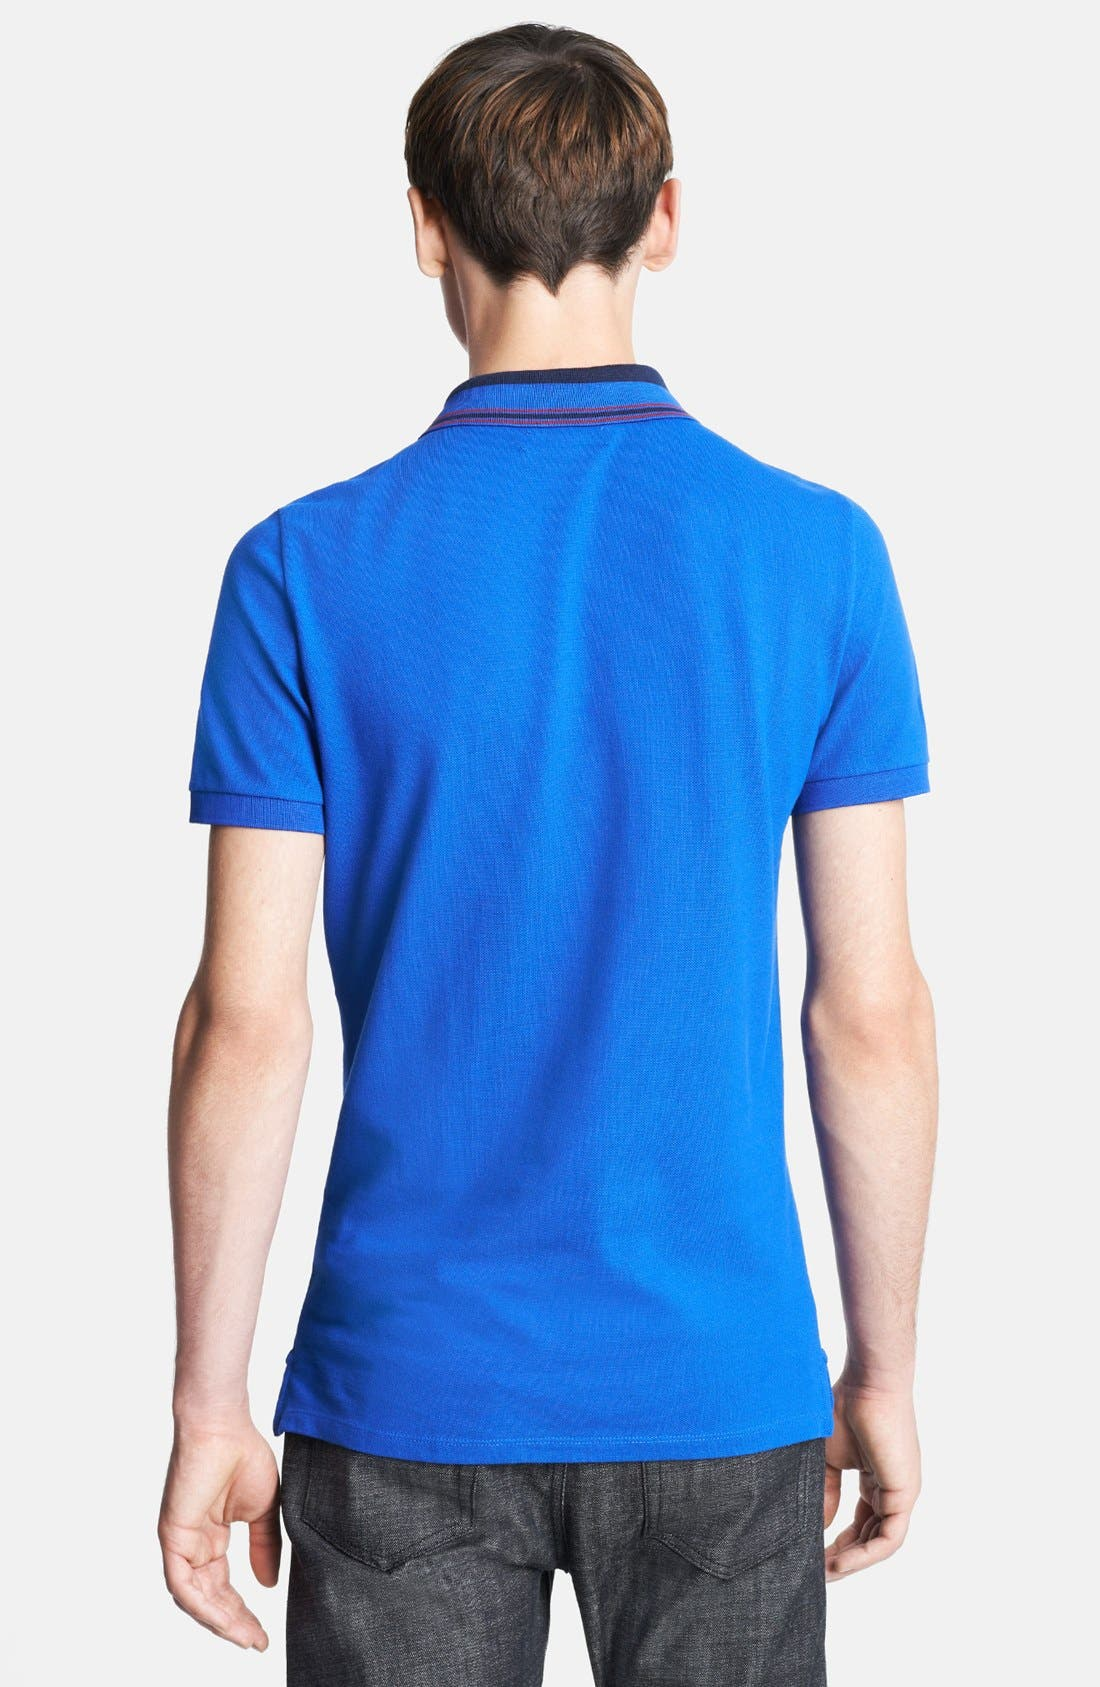 London 'Adler' Check Placket Cotton Polo,                             Alternate thumbnail 2, color,                             Bright Blue